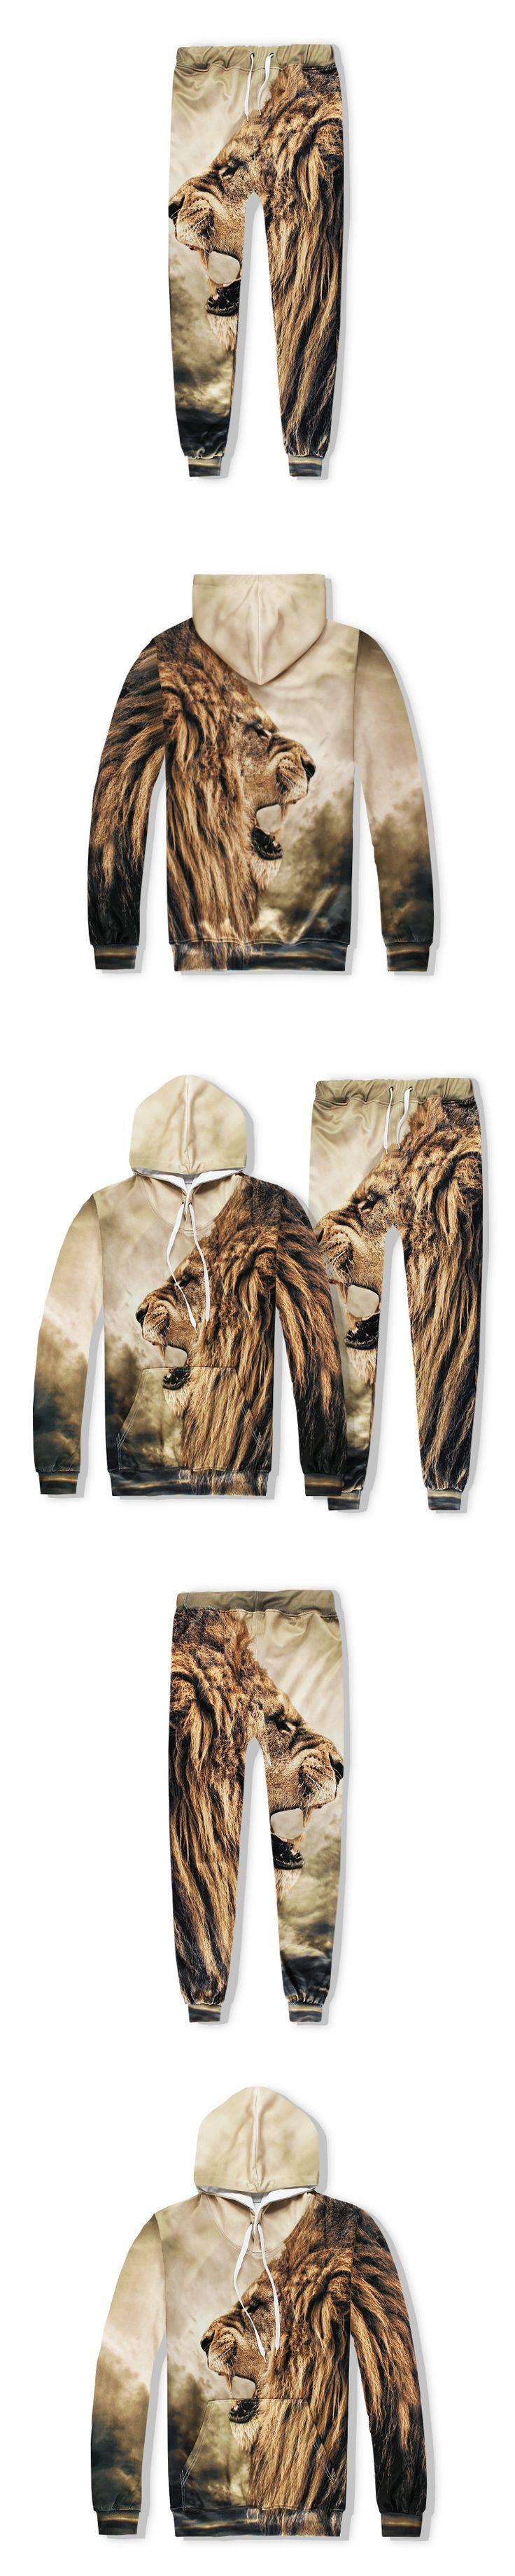 Mens 2017 Sets 3D Print Animal Lion Fashion Hip Hop Tracksuit Top+Pants Brand Clothing S-2XL